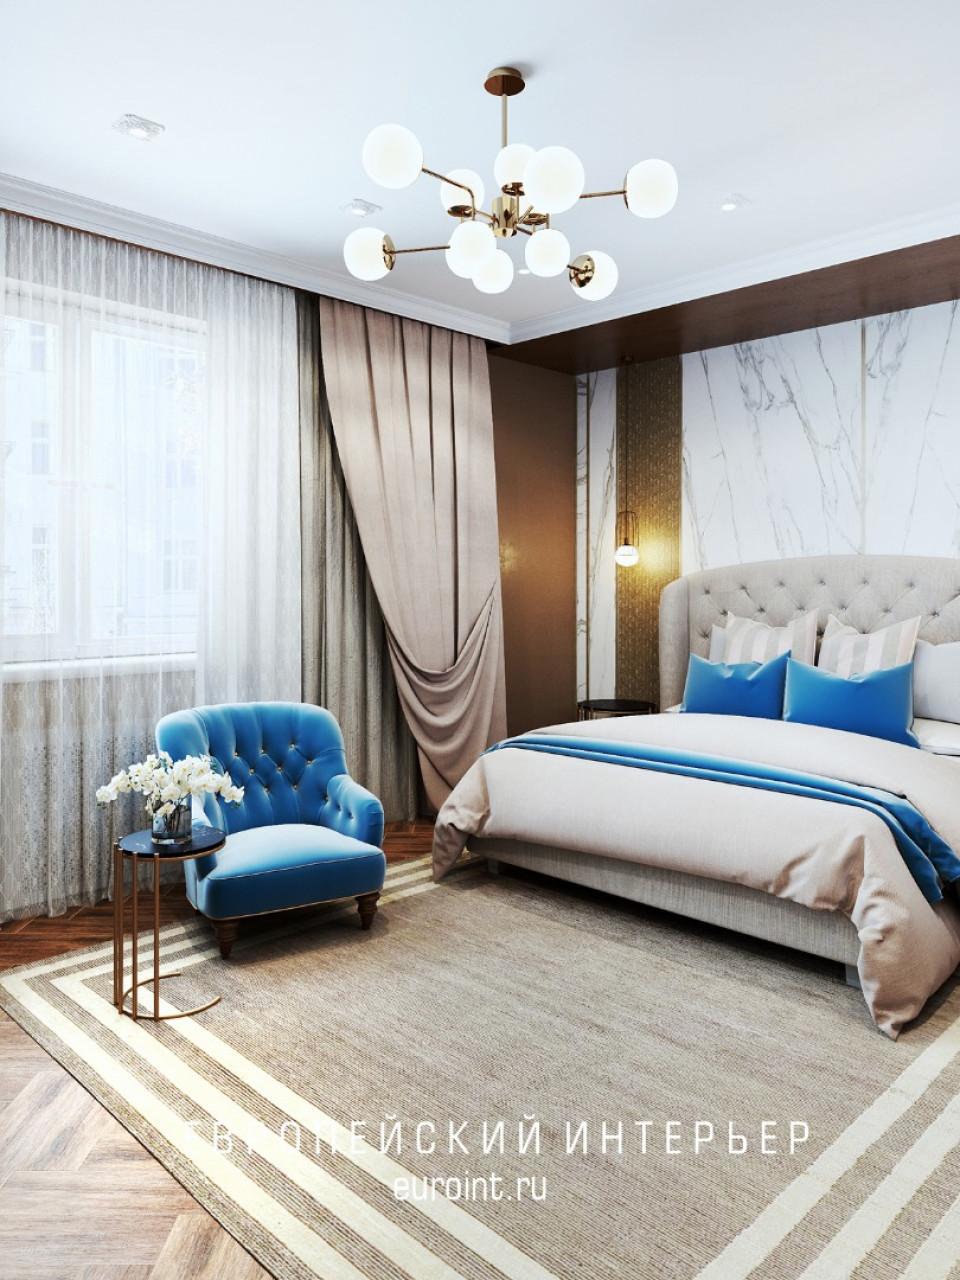 4-х комнатная квартира 138м2